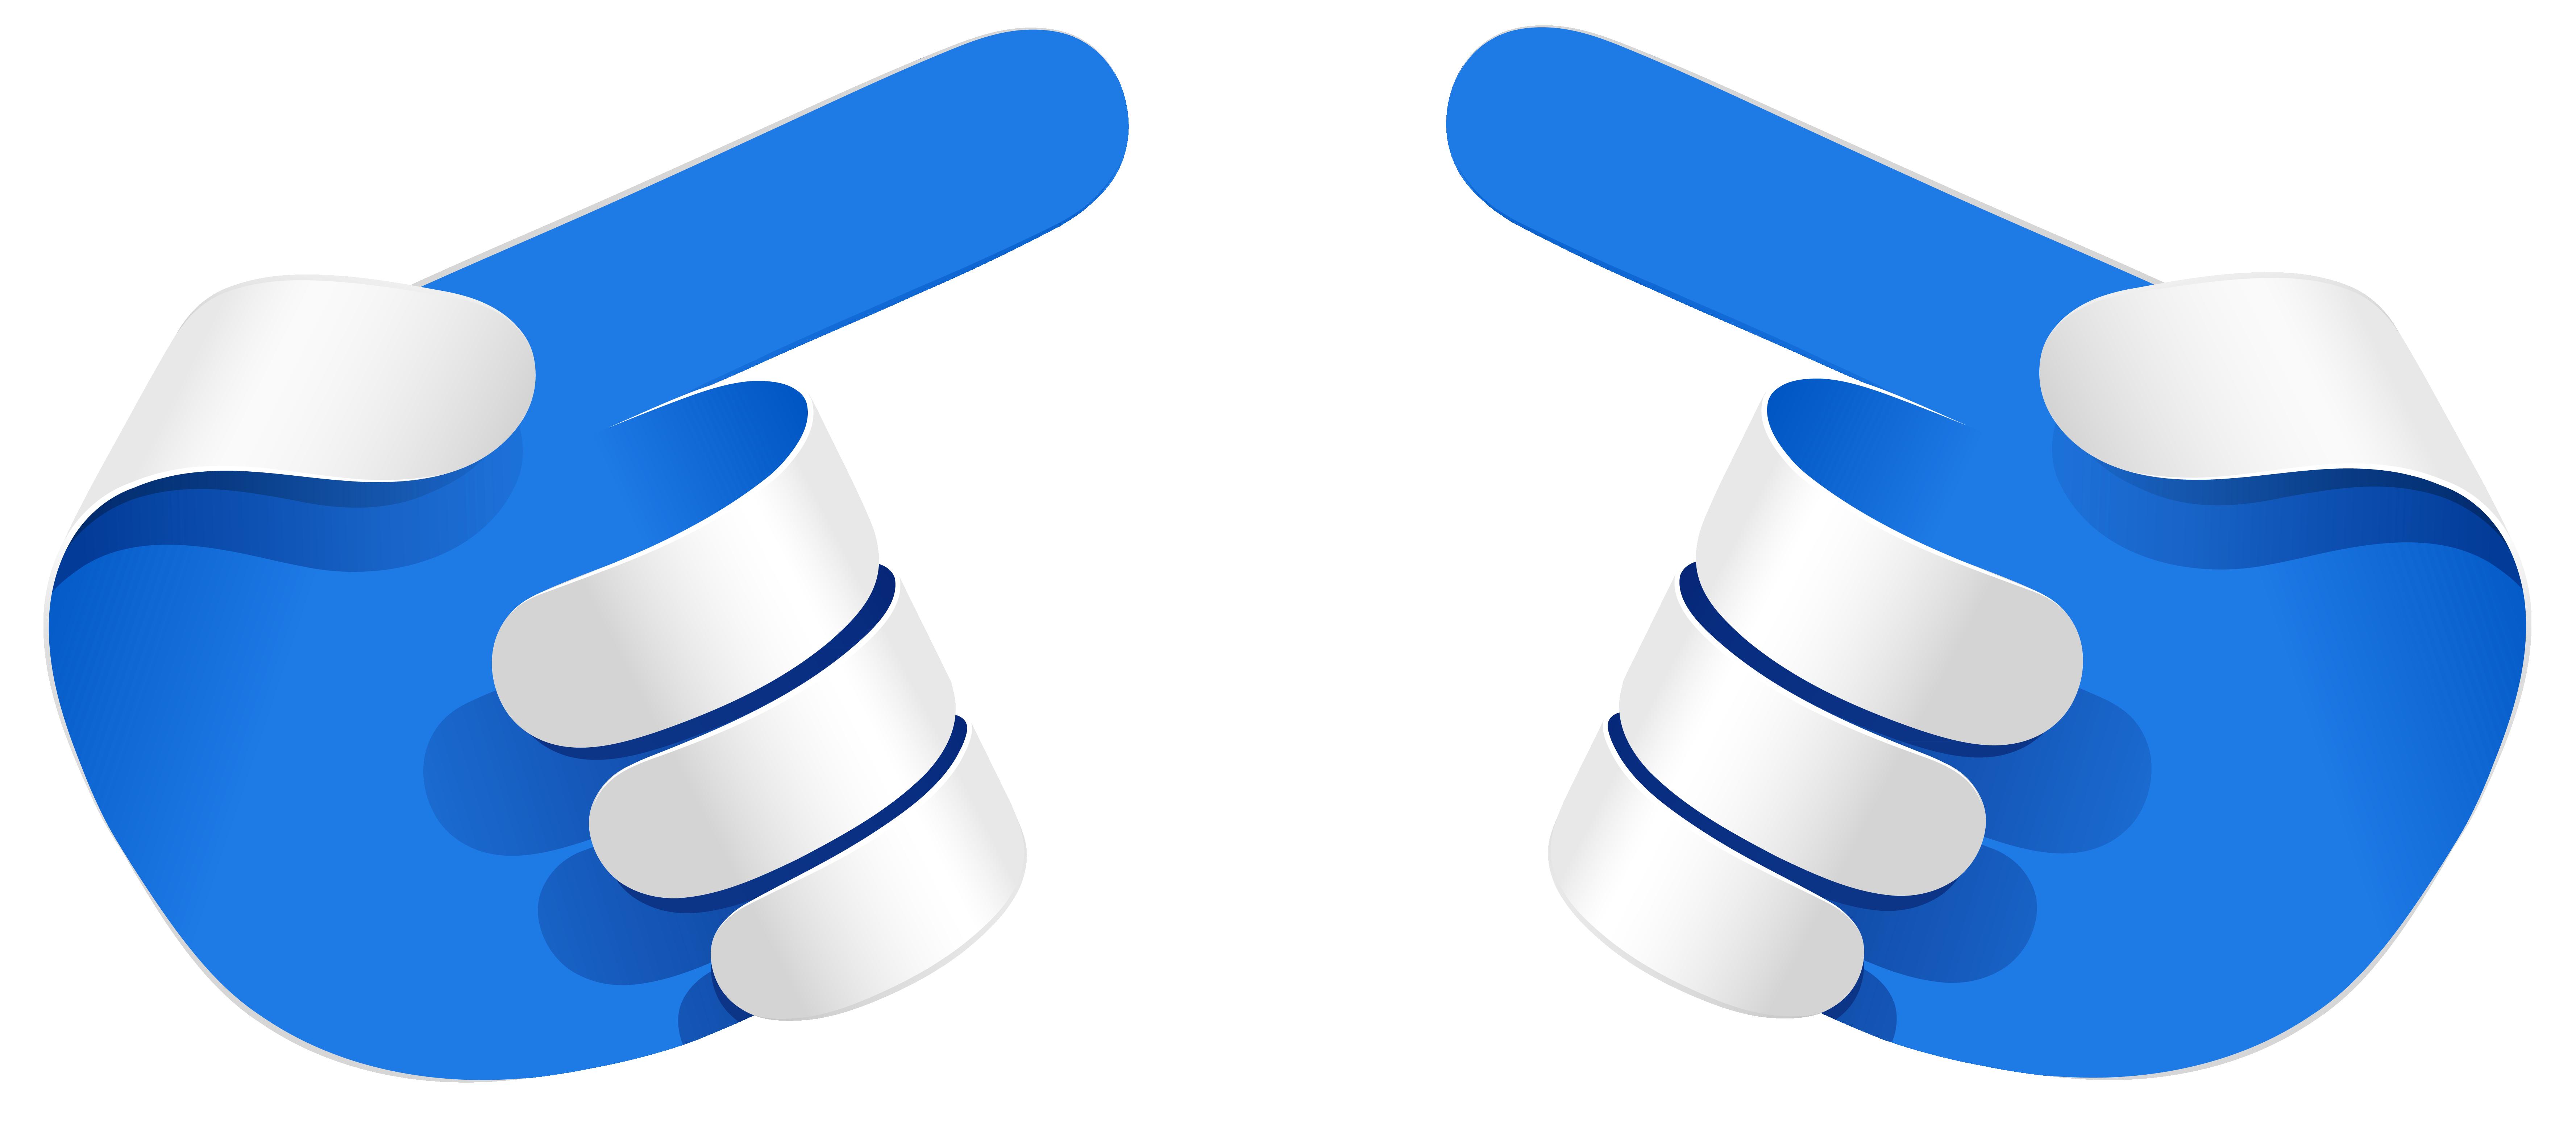 Blue hands arrows transparent. Hand clipart border